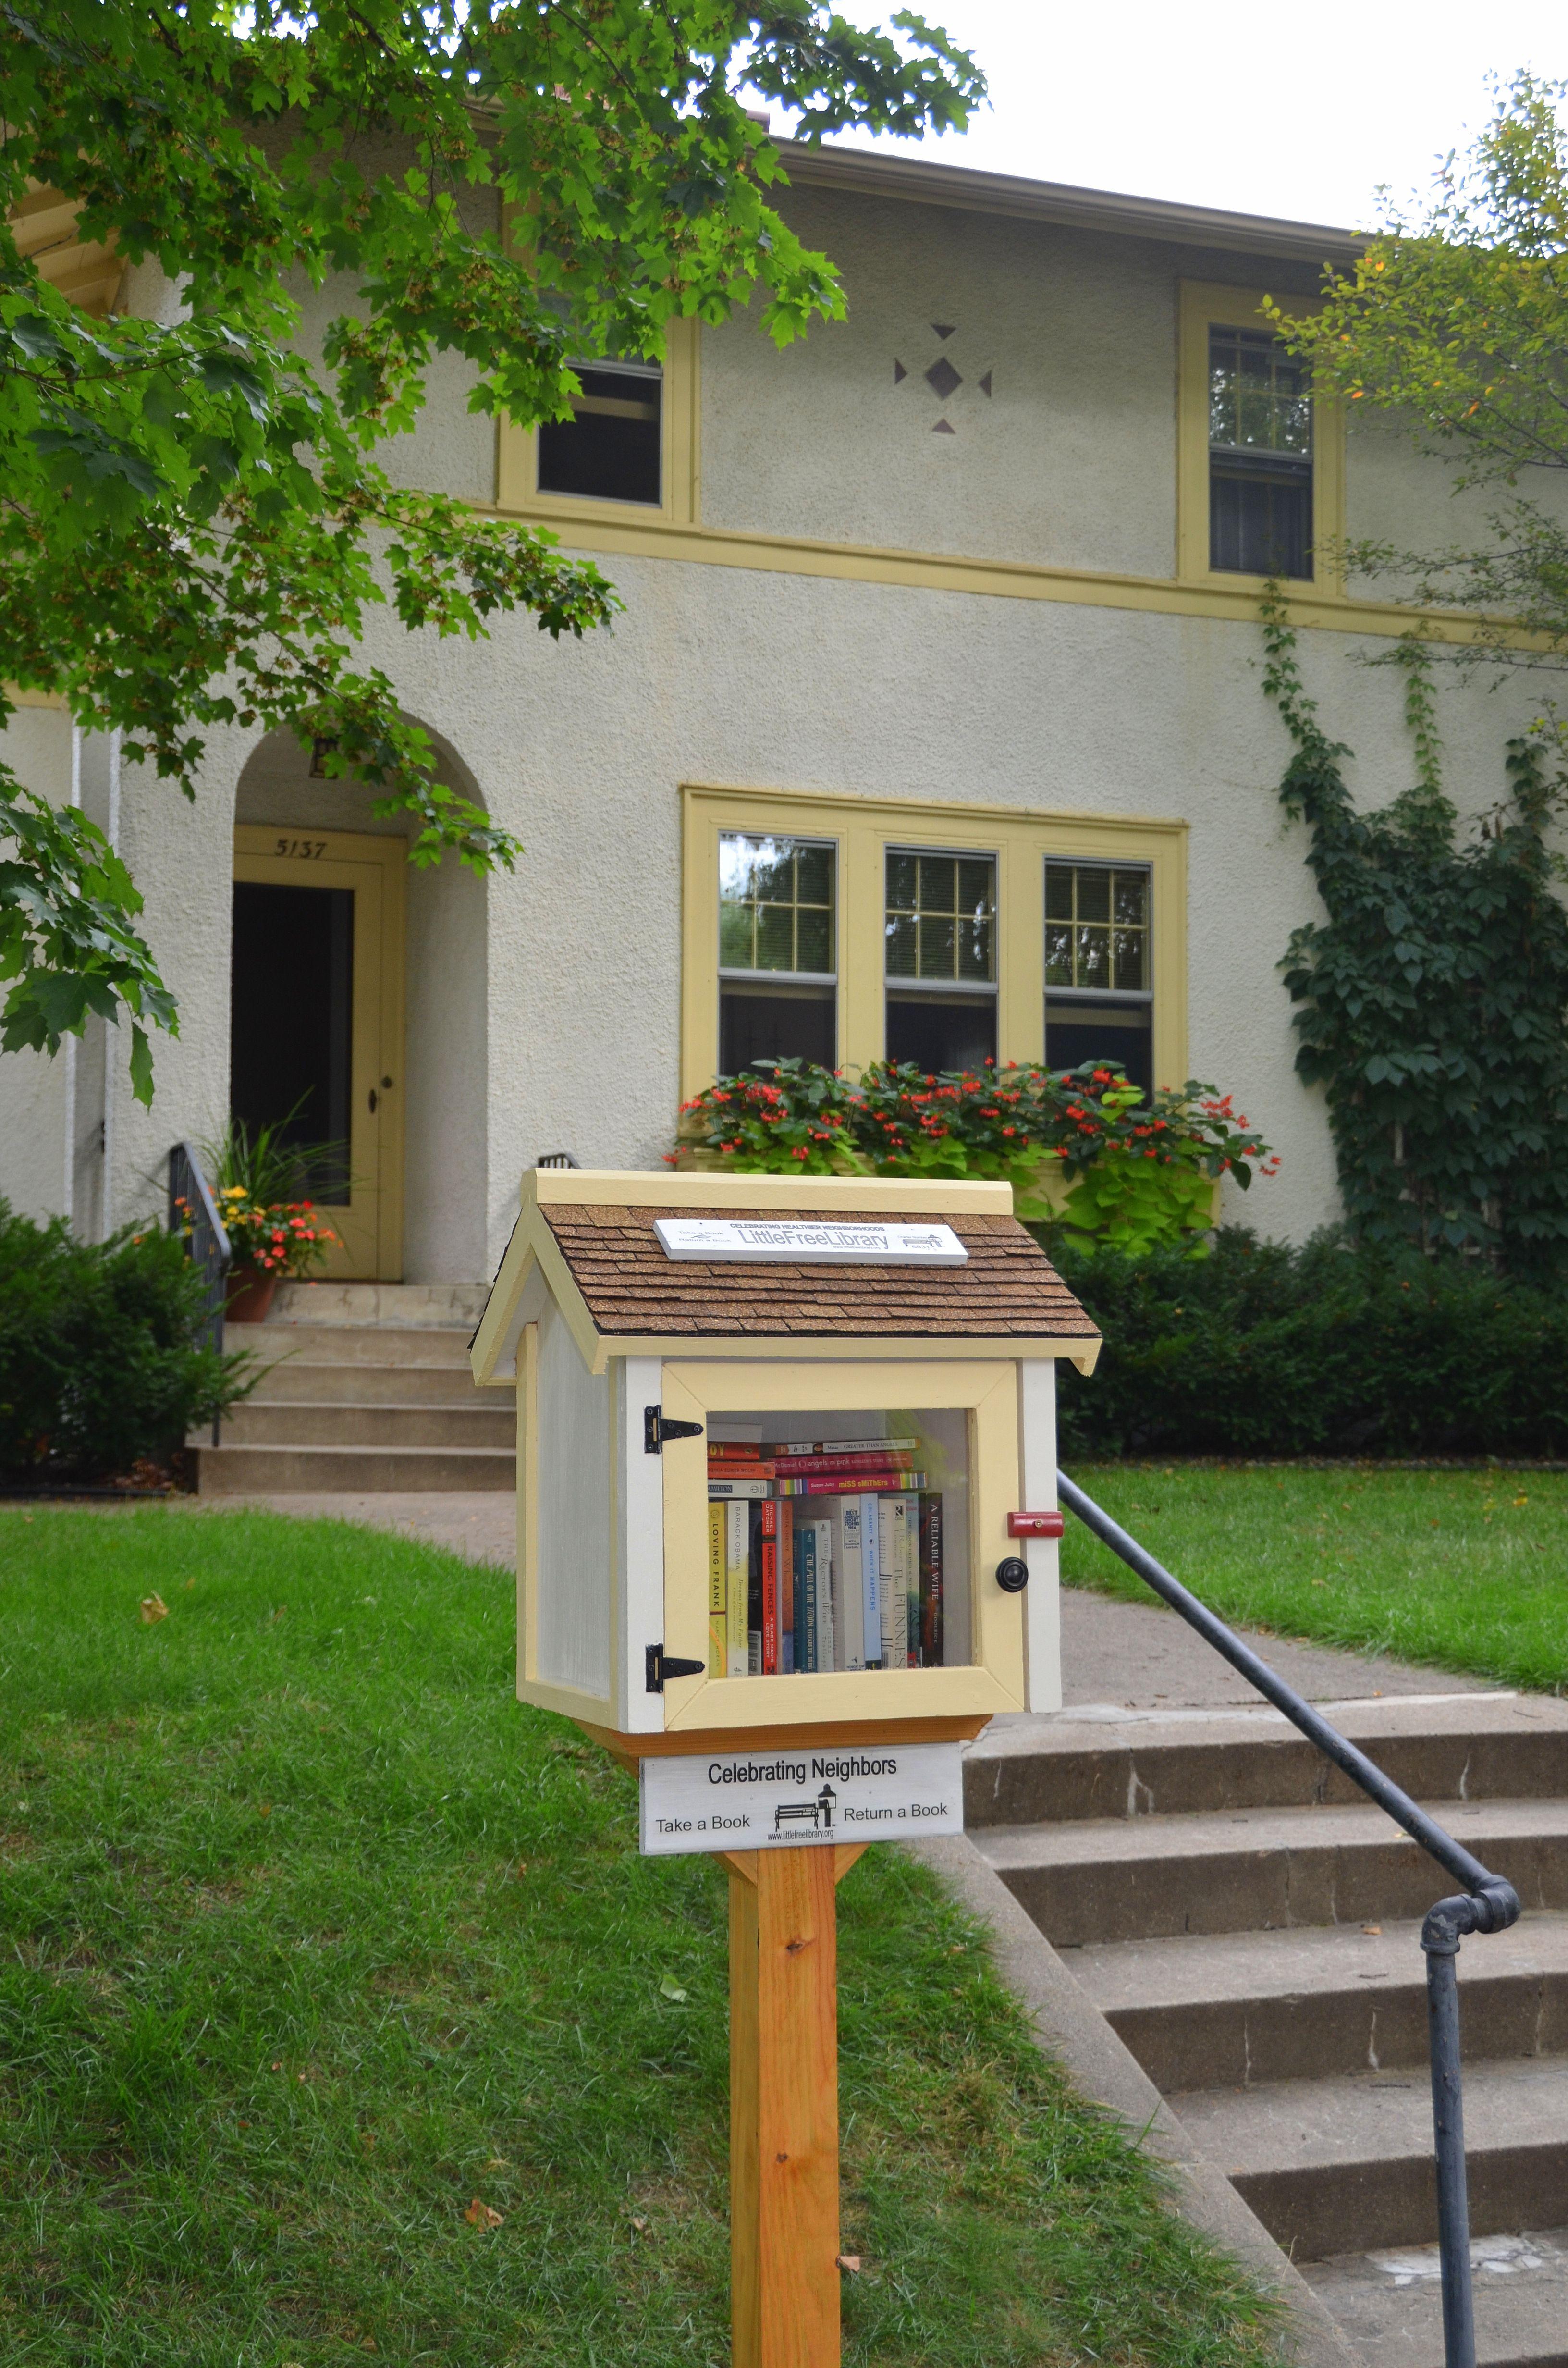 Little free library in Minneapolis, MinnesotaThese